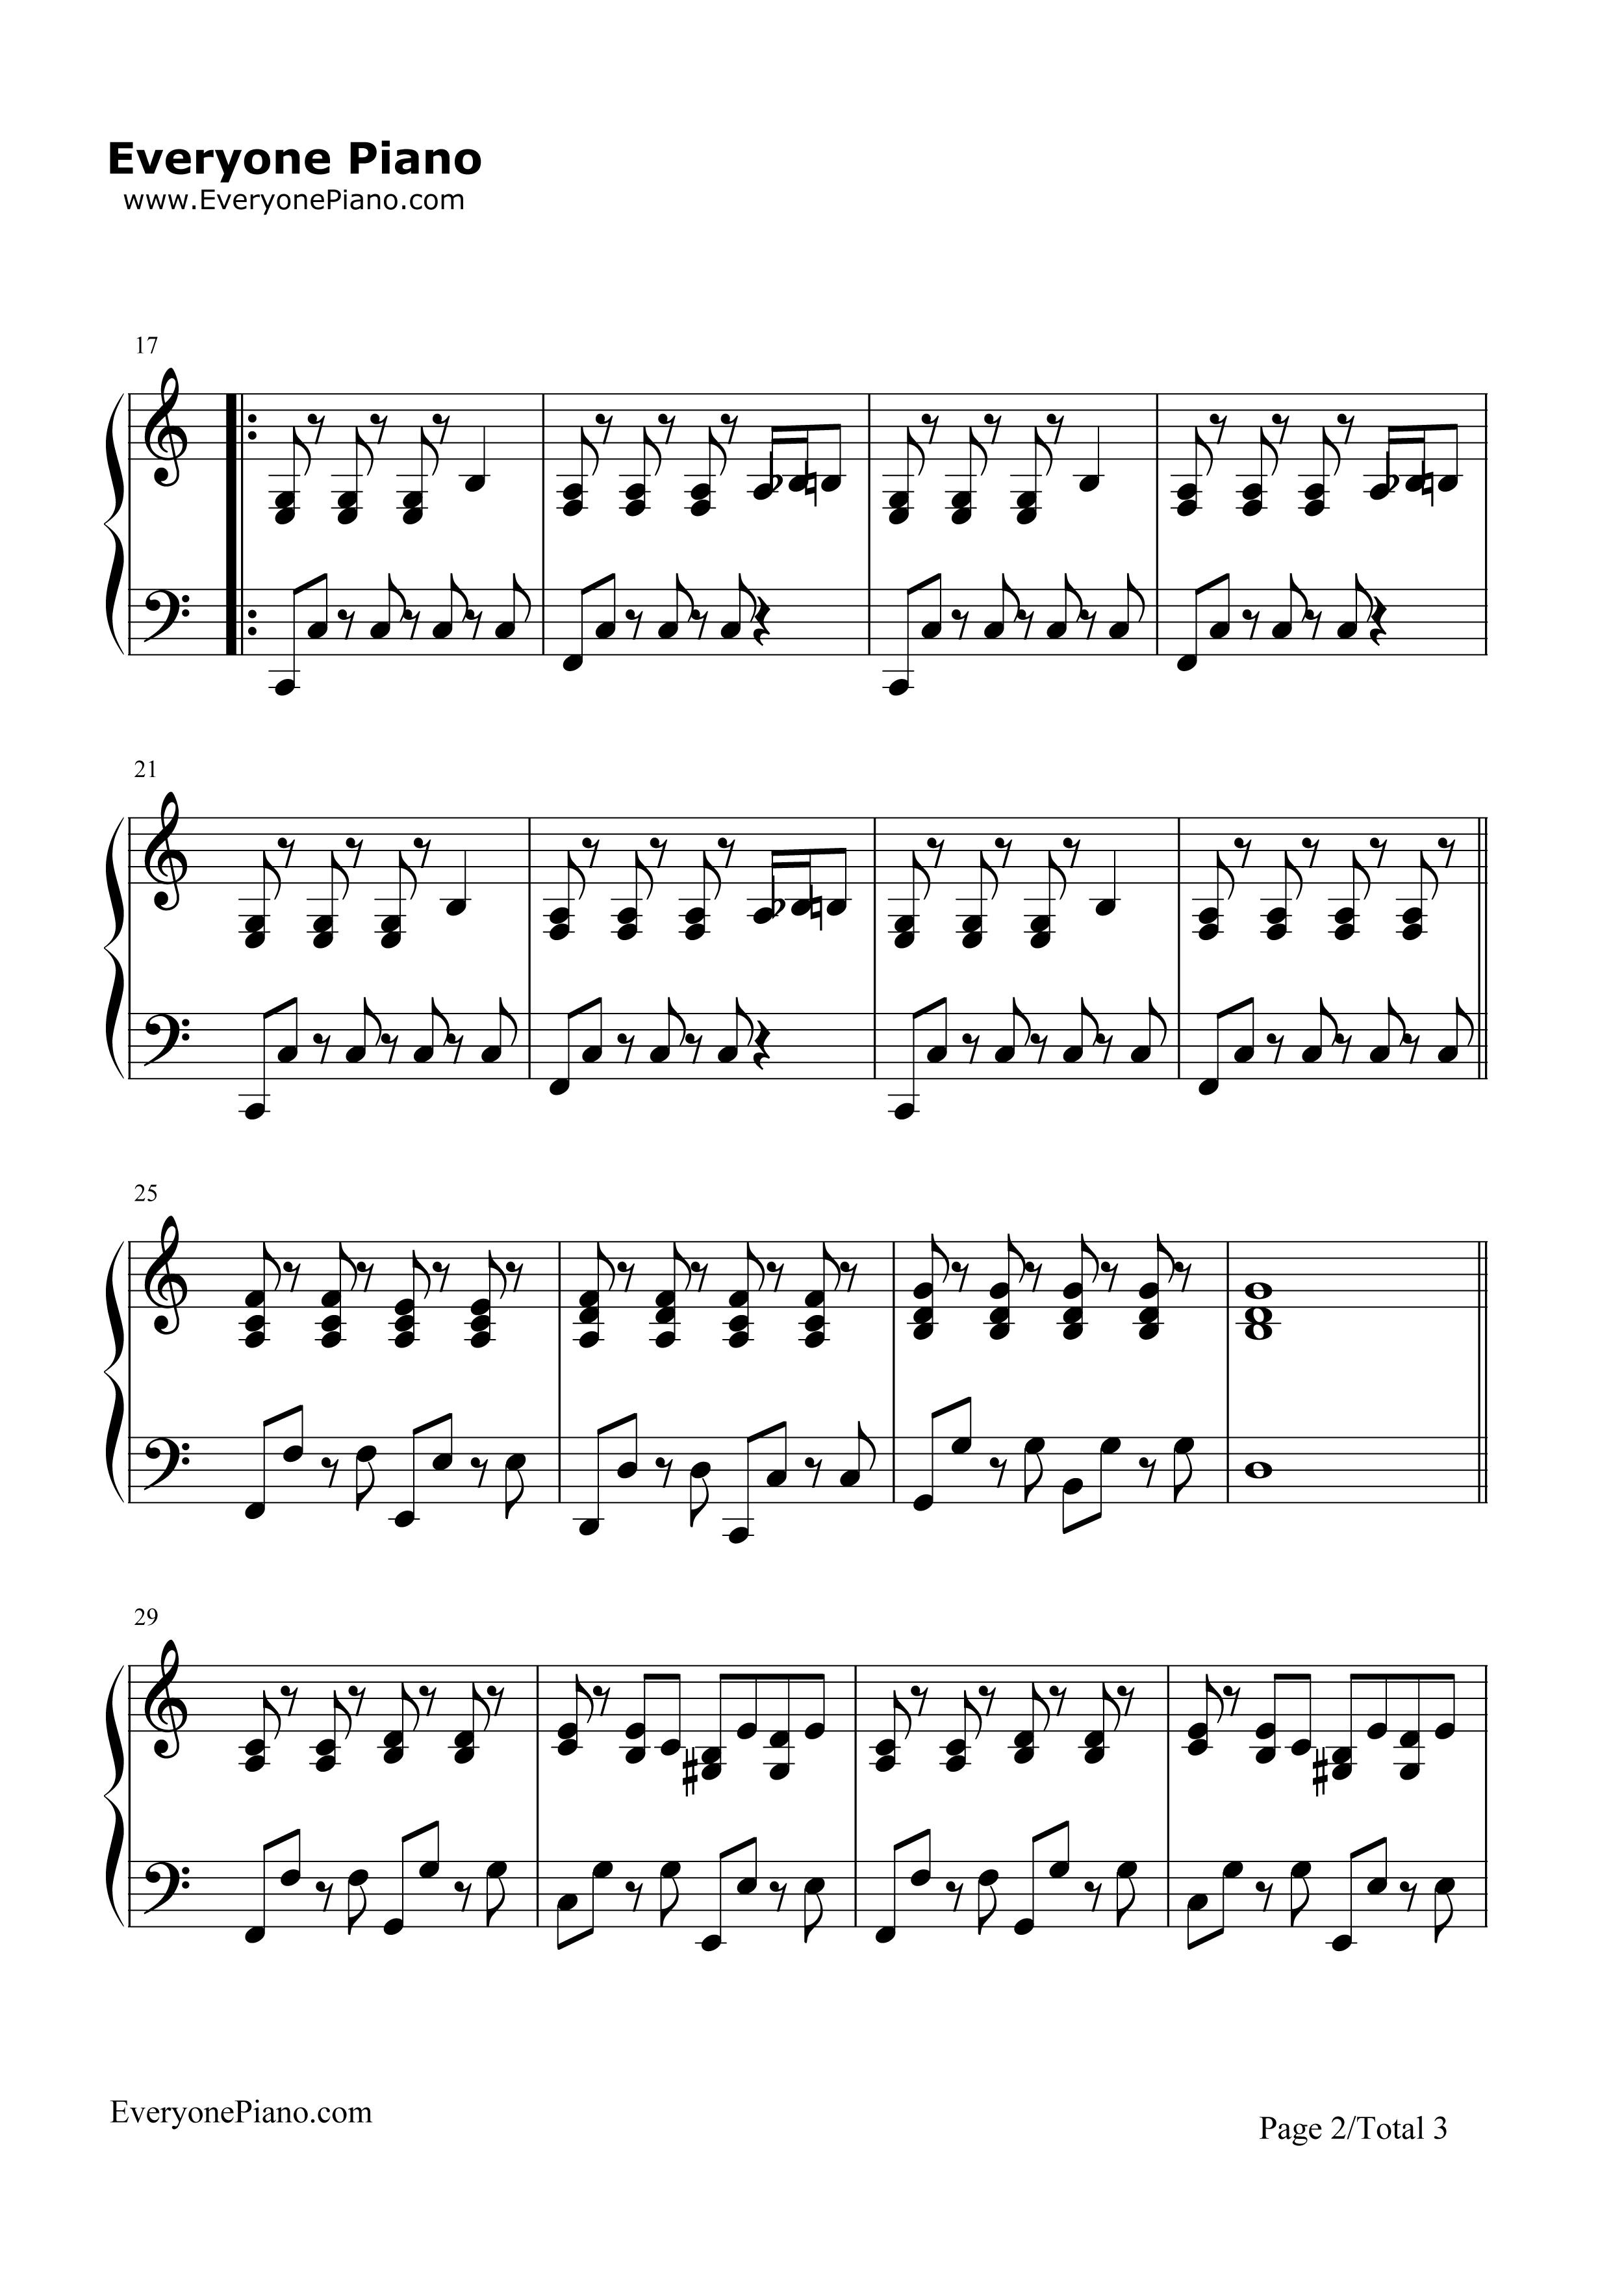 Imagine-John Lennon Stave Preview 2-Free Piano Sheet Music u0026 Piano Chords